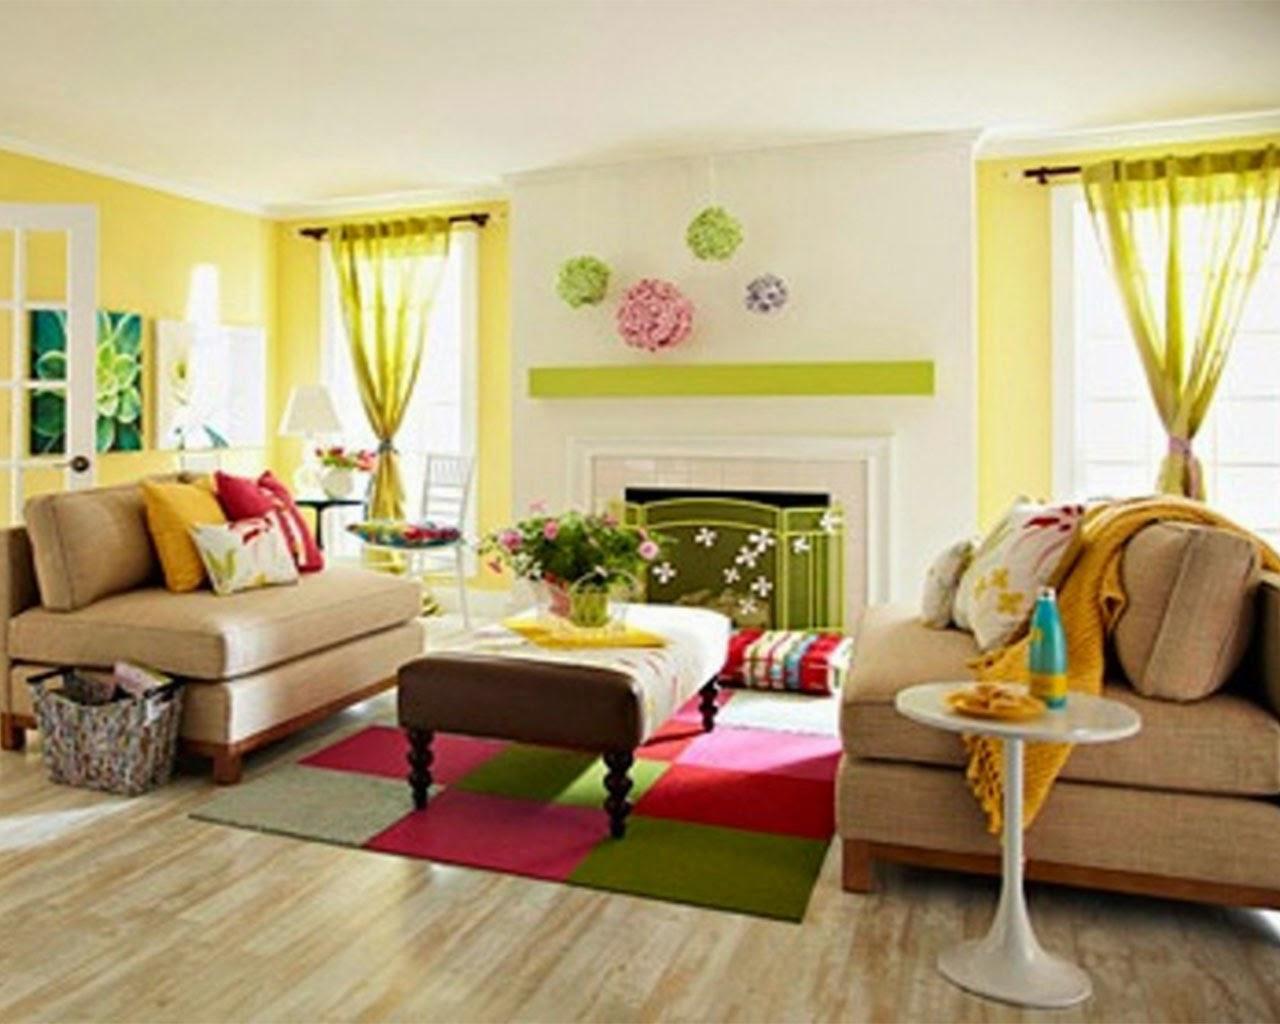 Yellow Walls Living Room Interior Decor Elite Decor 2015 Decorating Ideas With Yellow Color